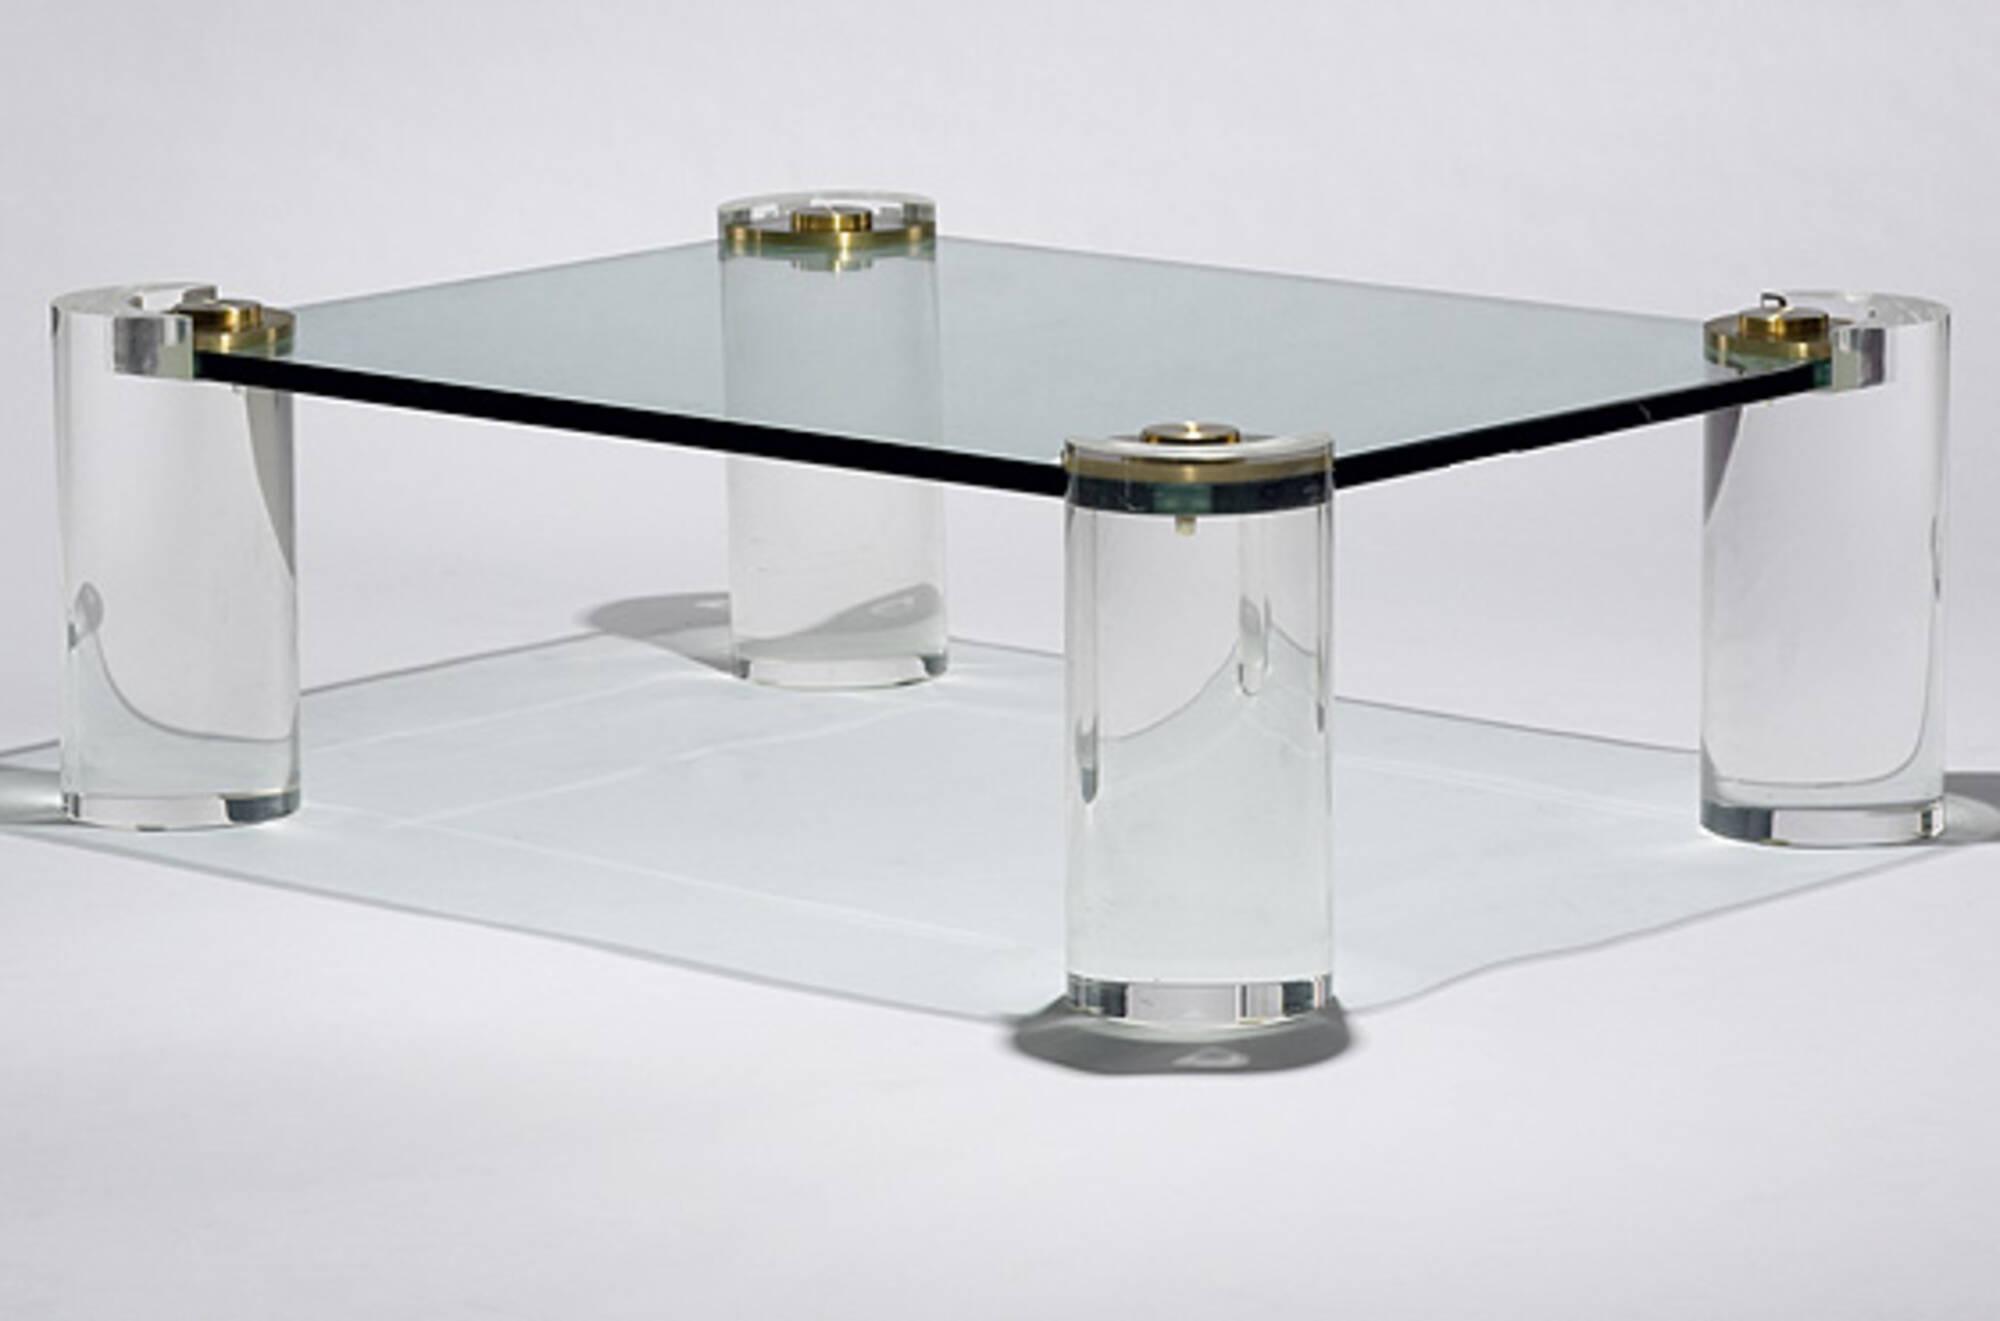 525: Karl Springer / Coffee Table (1 Of 1)